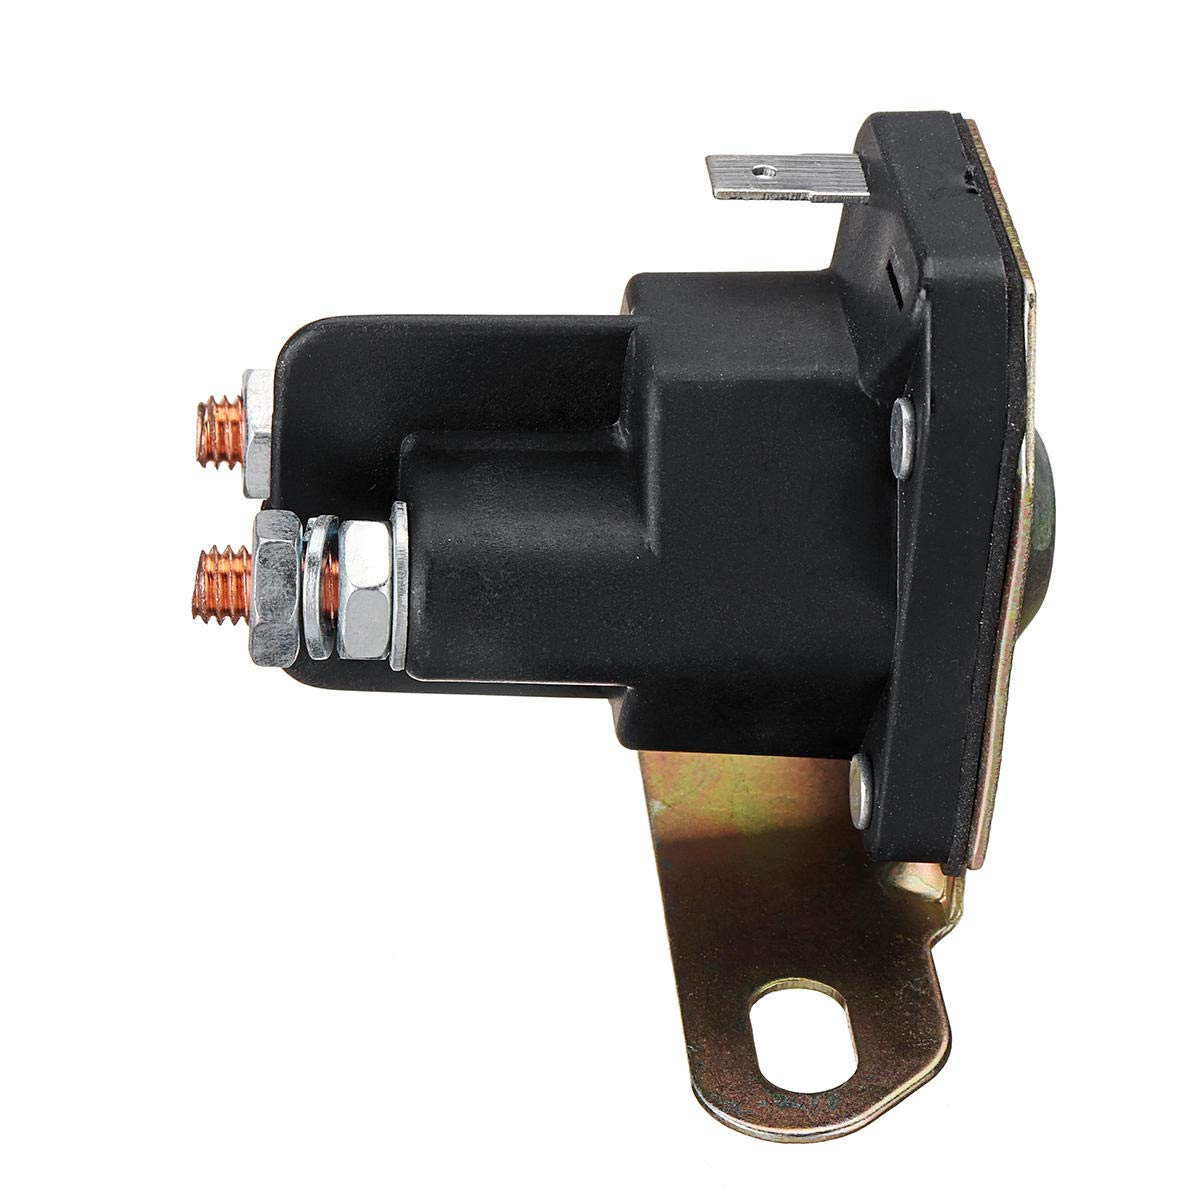 RENCALO 12-V-Magnetrelaisschalter f/ür Trombetta 812-1211-211 9326519 932651WR 93265WR